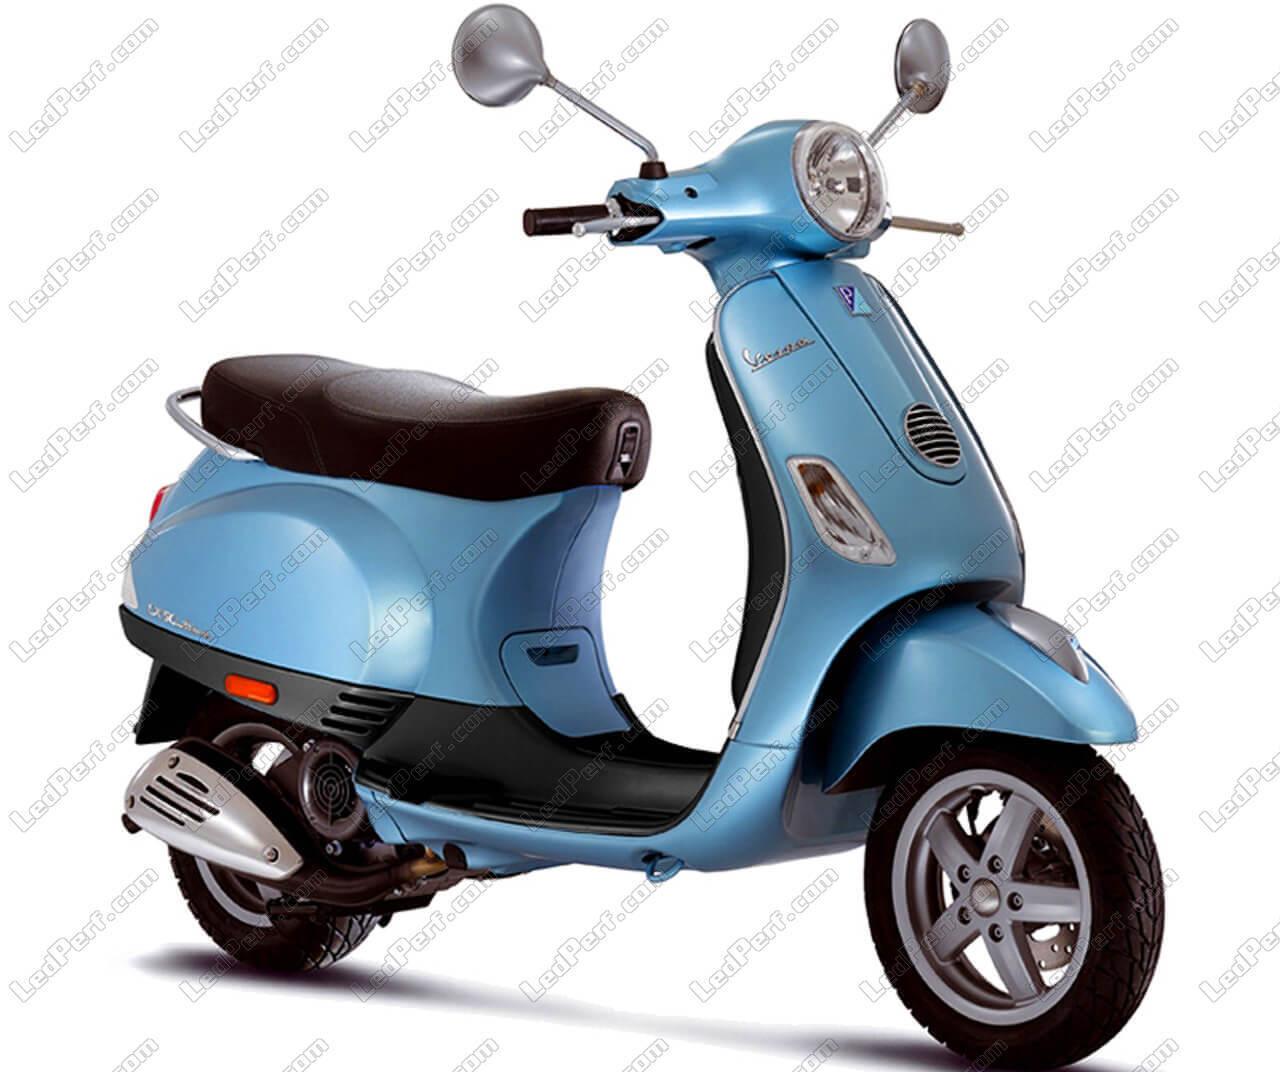 hight resolution of packs par marque moto scooter quad ssv spyder vespa lx 50